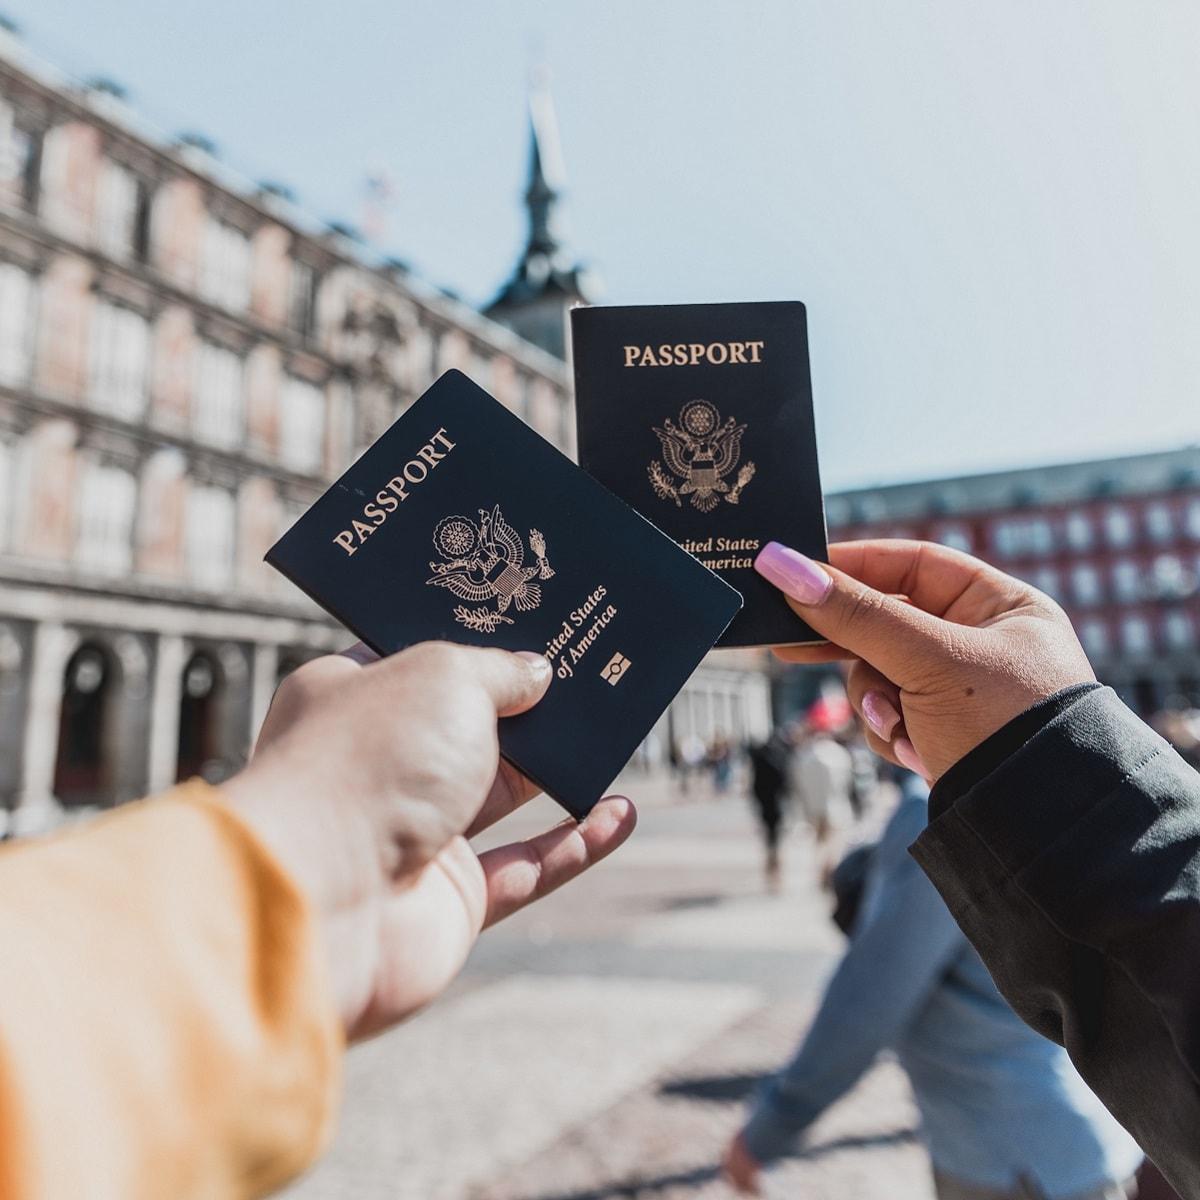 Panduan Mengurus Paspor Hilang di Luar Negeri - Sumber Unsplash